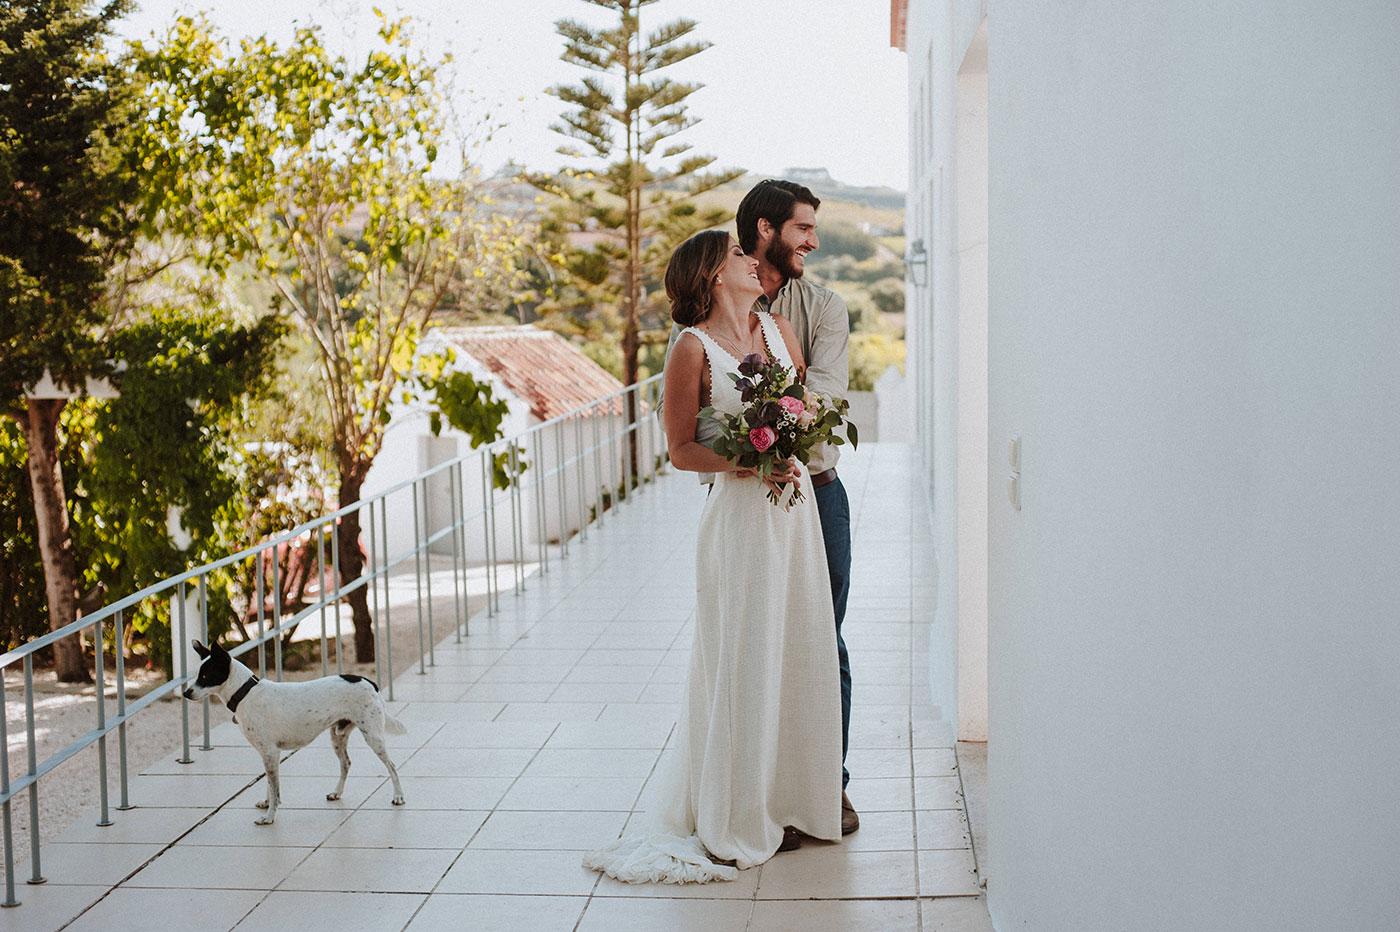 Casa Sacoto Wedding Venue